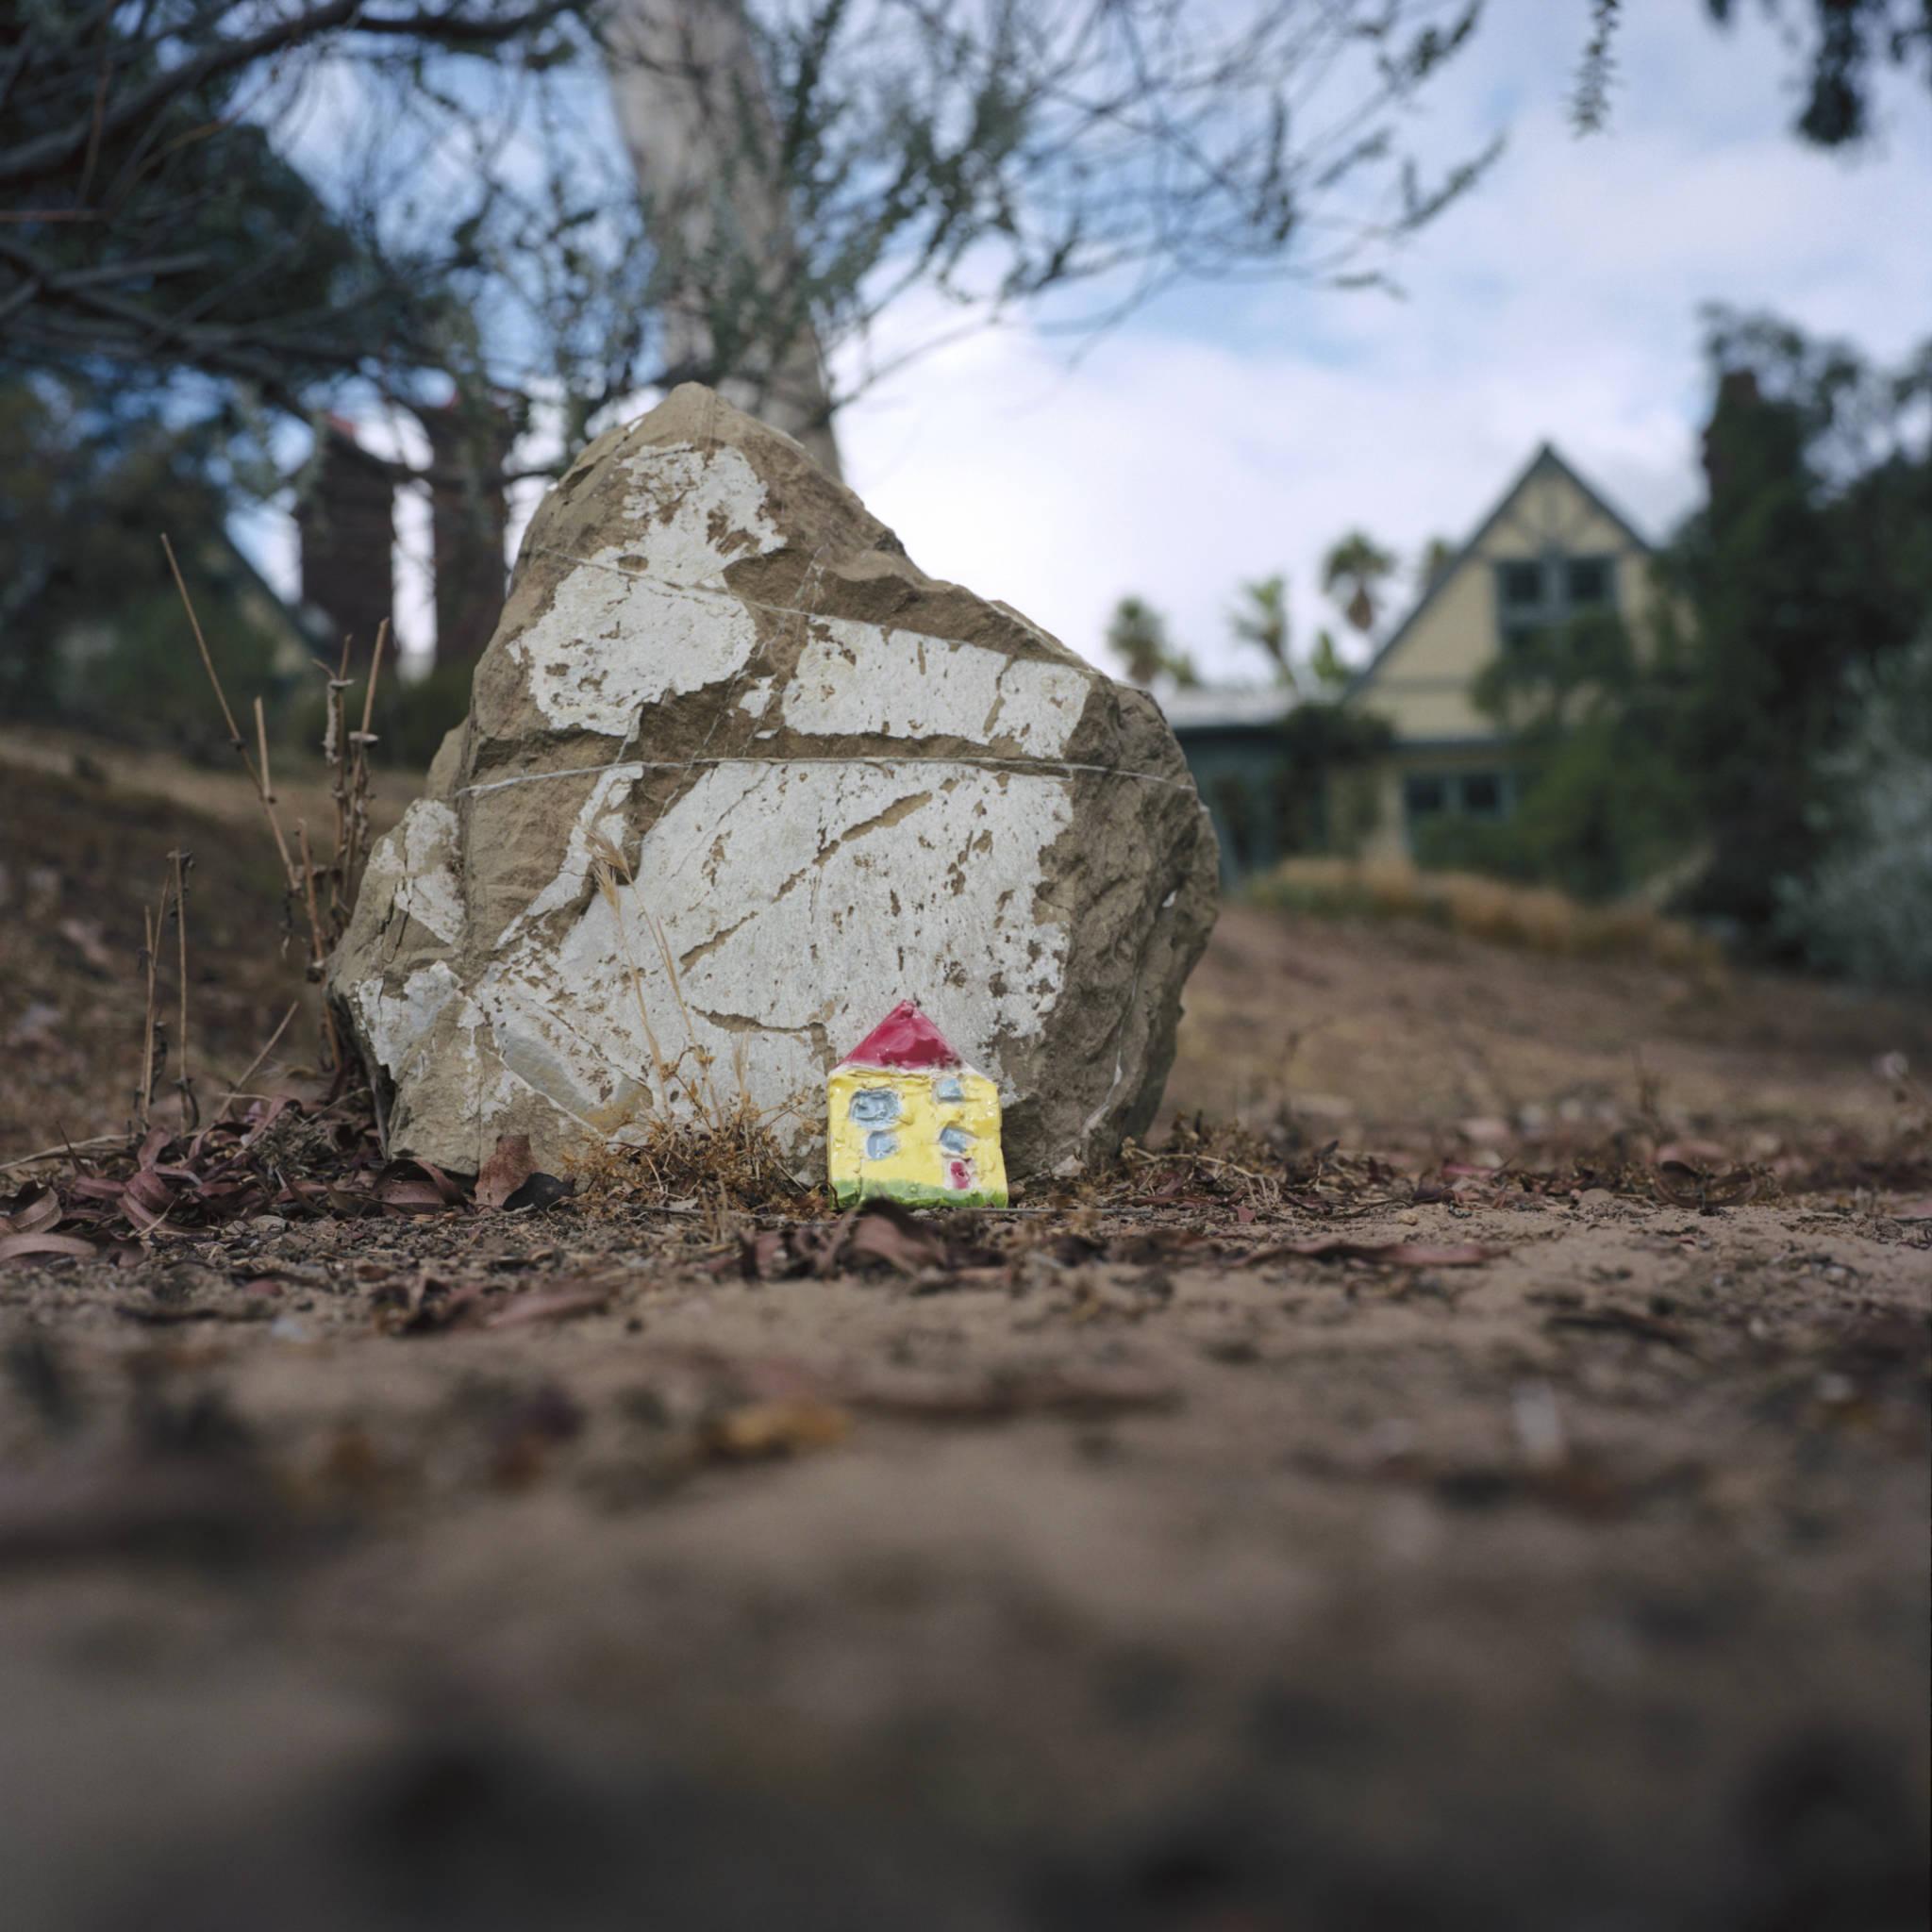 Mercedes Dorame, 'Visions of home - Xaroochot Huuhuvaroy,' 2013.